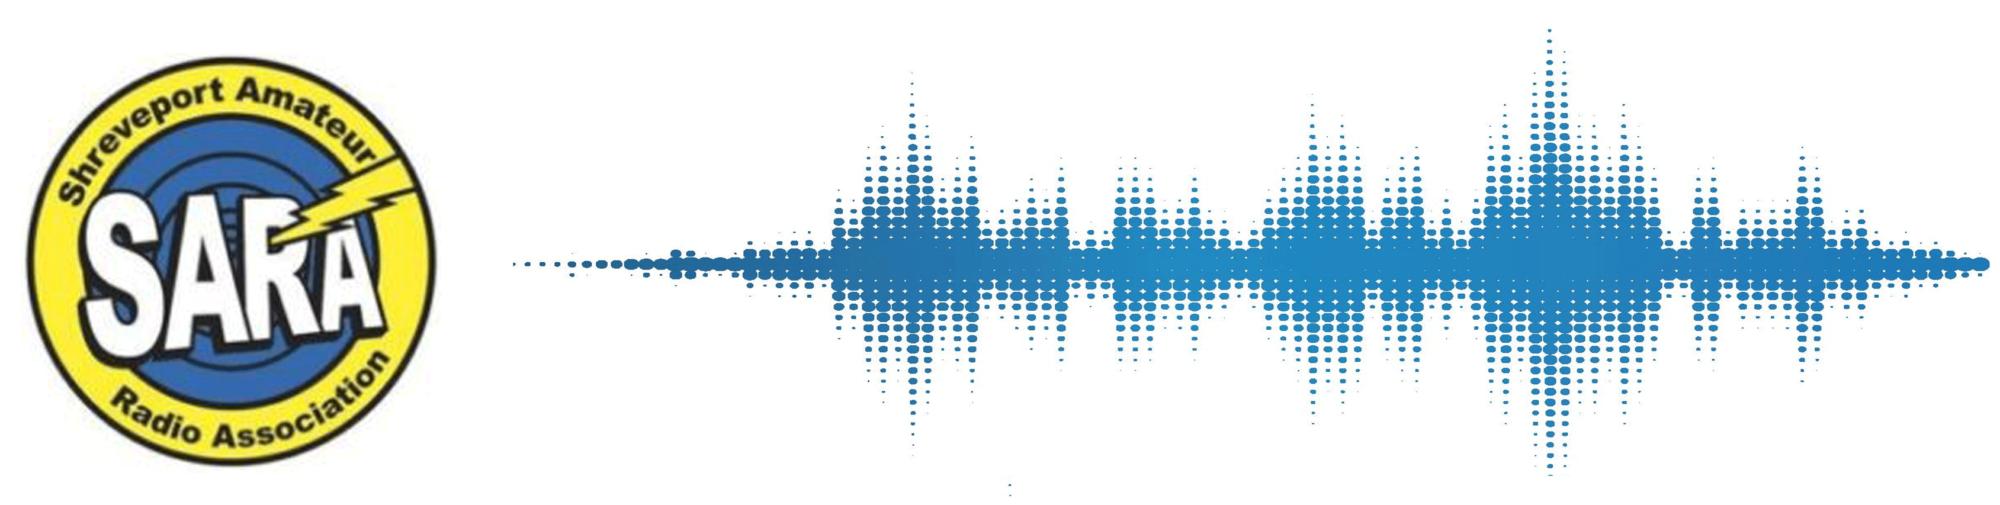 Shreveport Amateur Radio Association